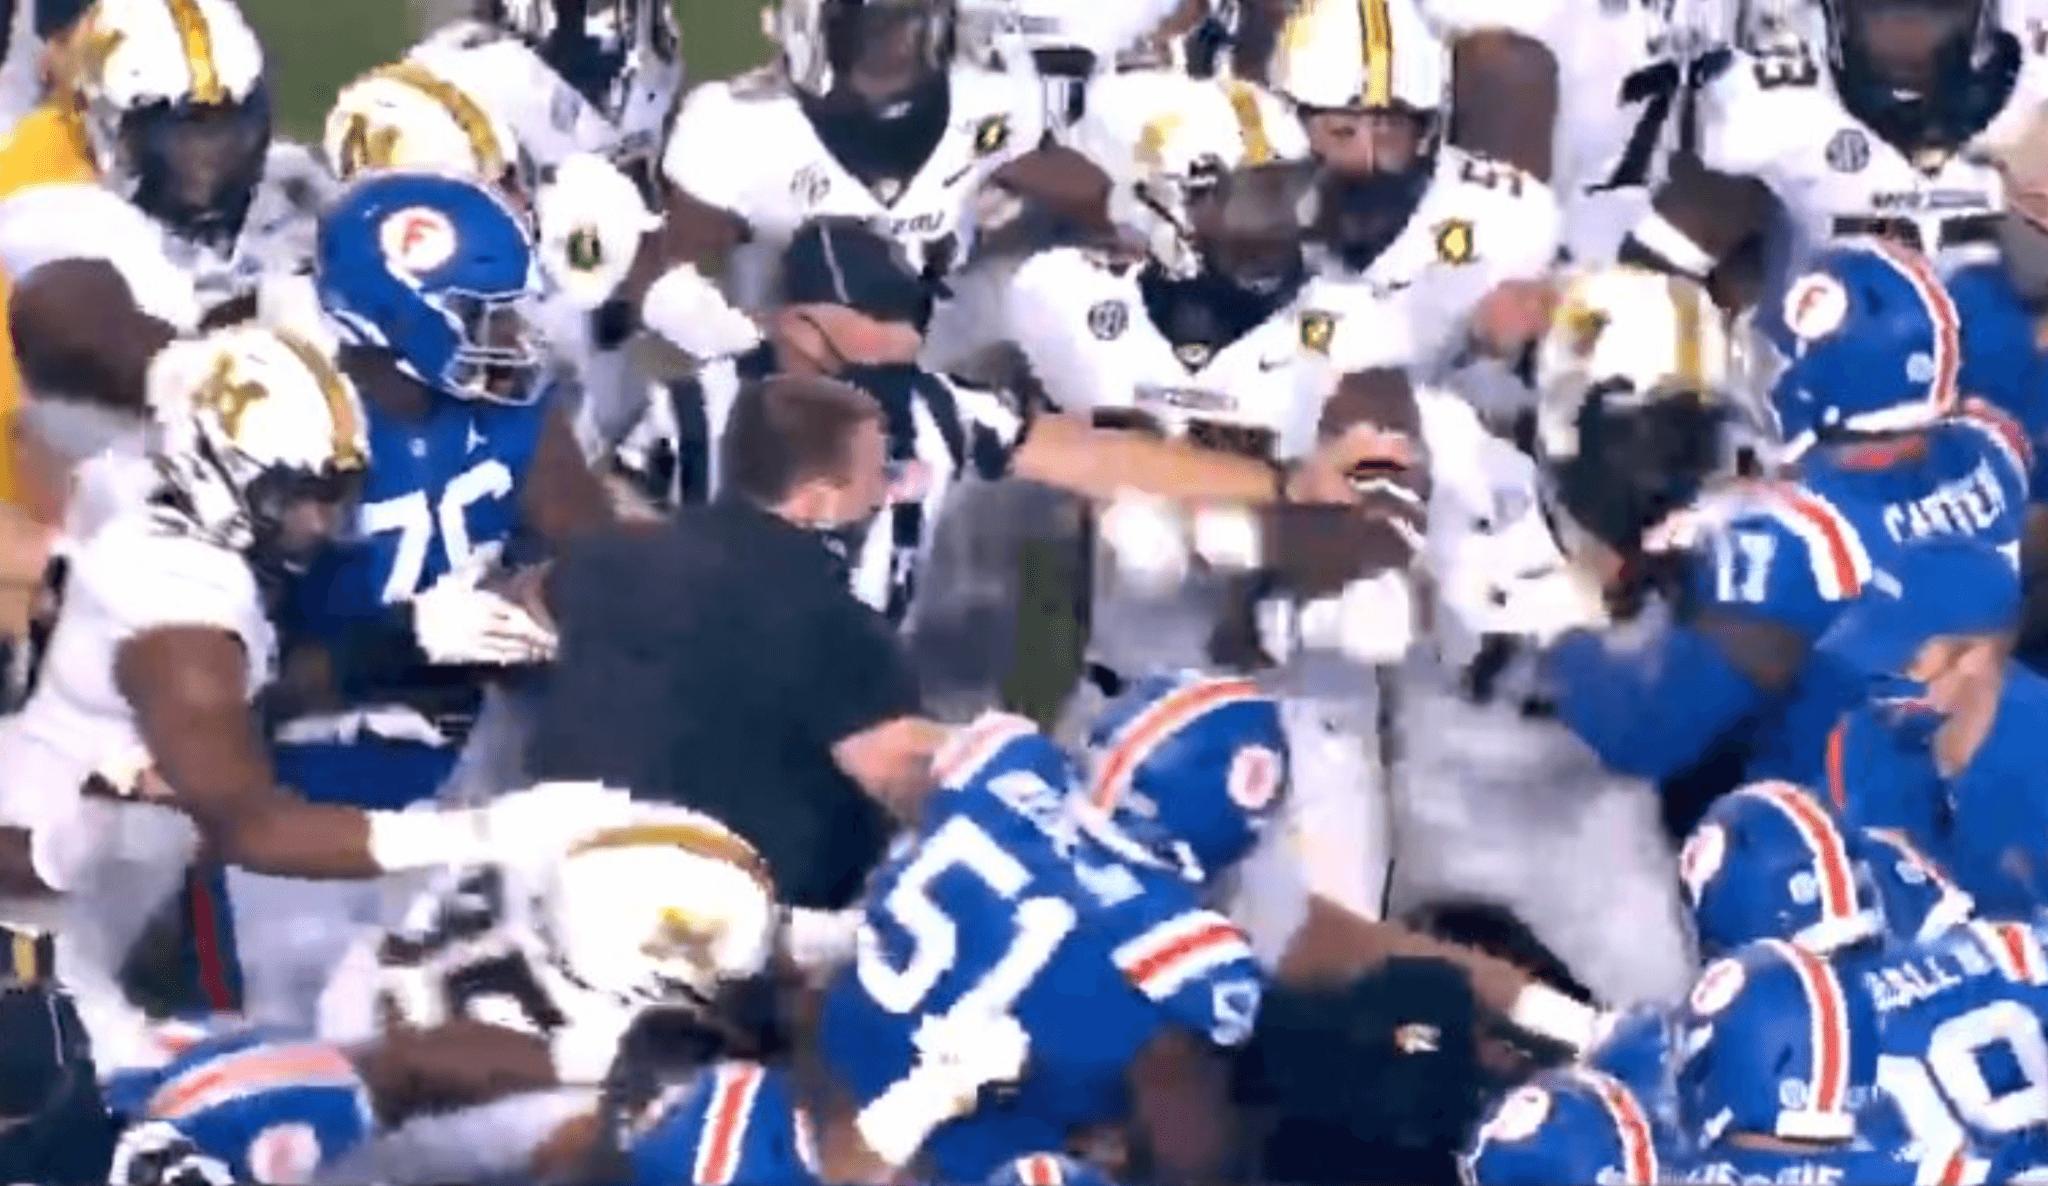 Florida-Missouri brawl